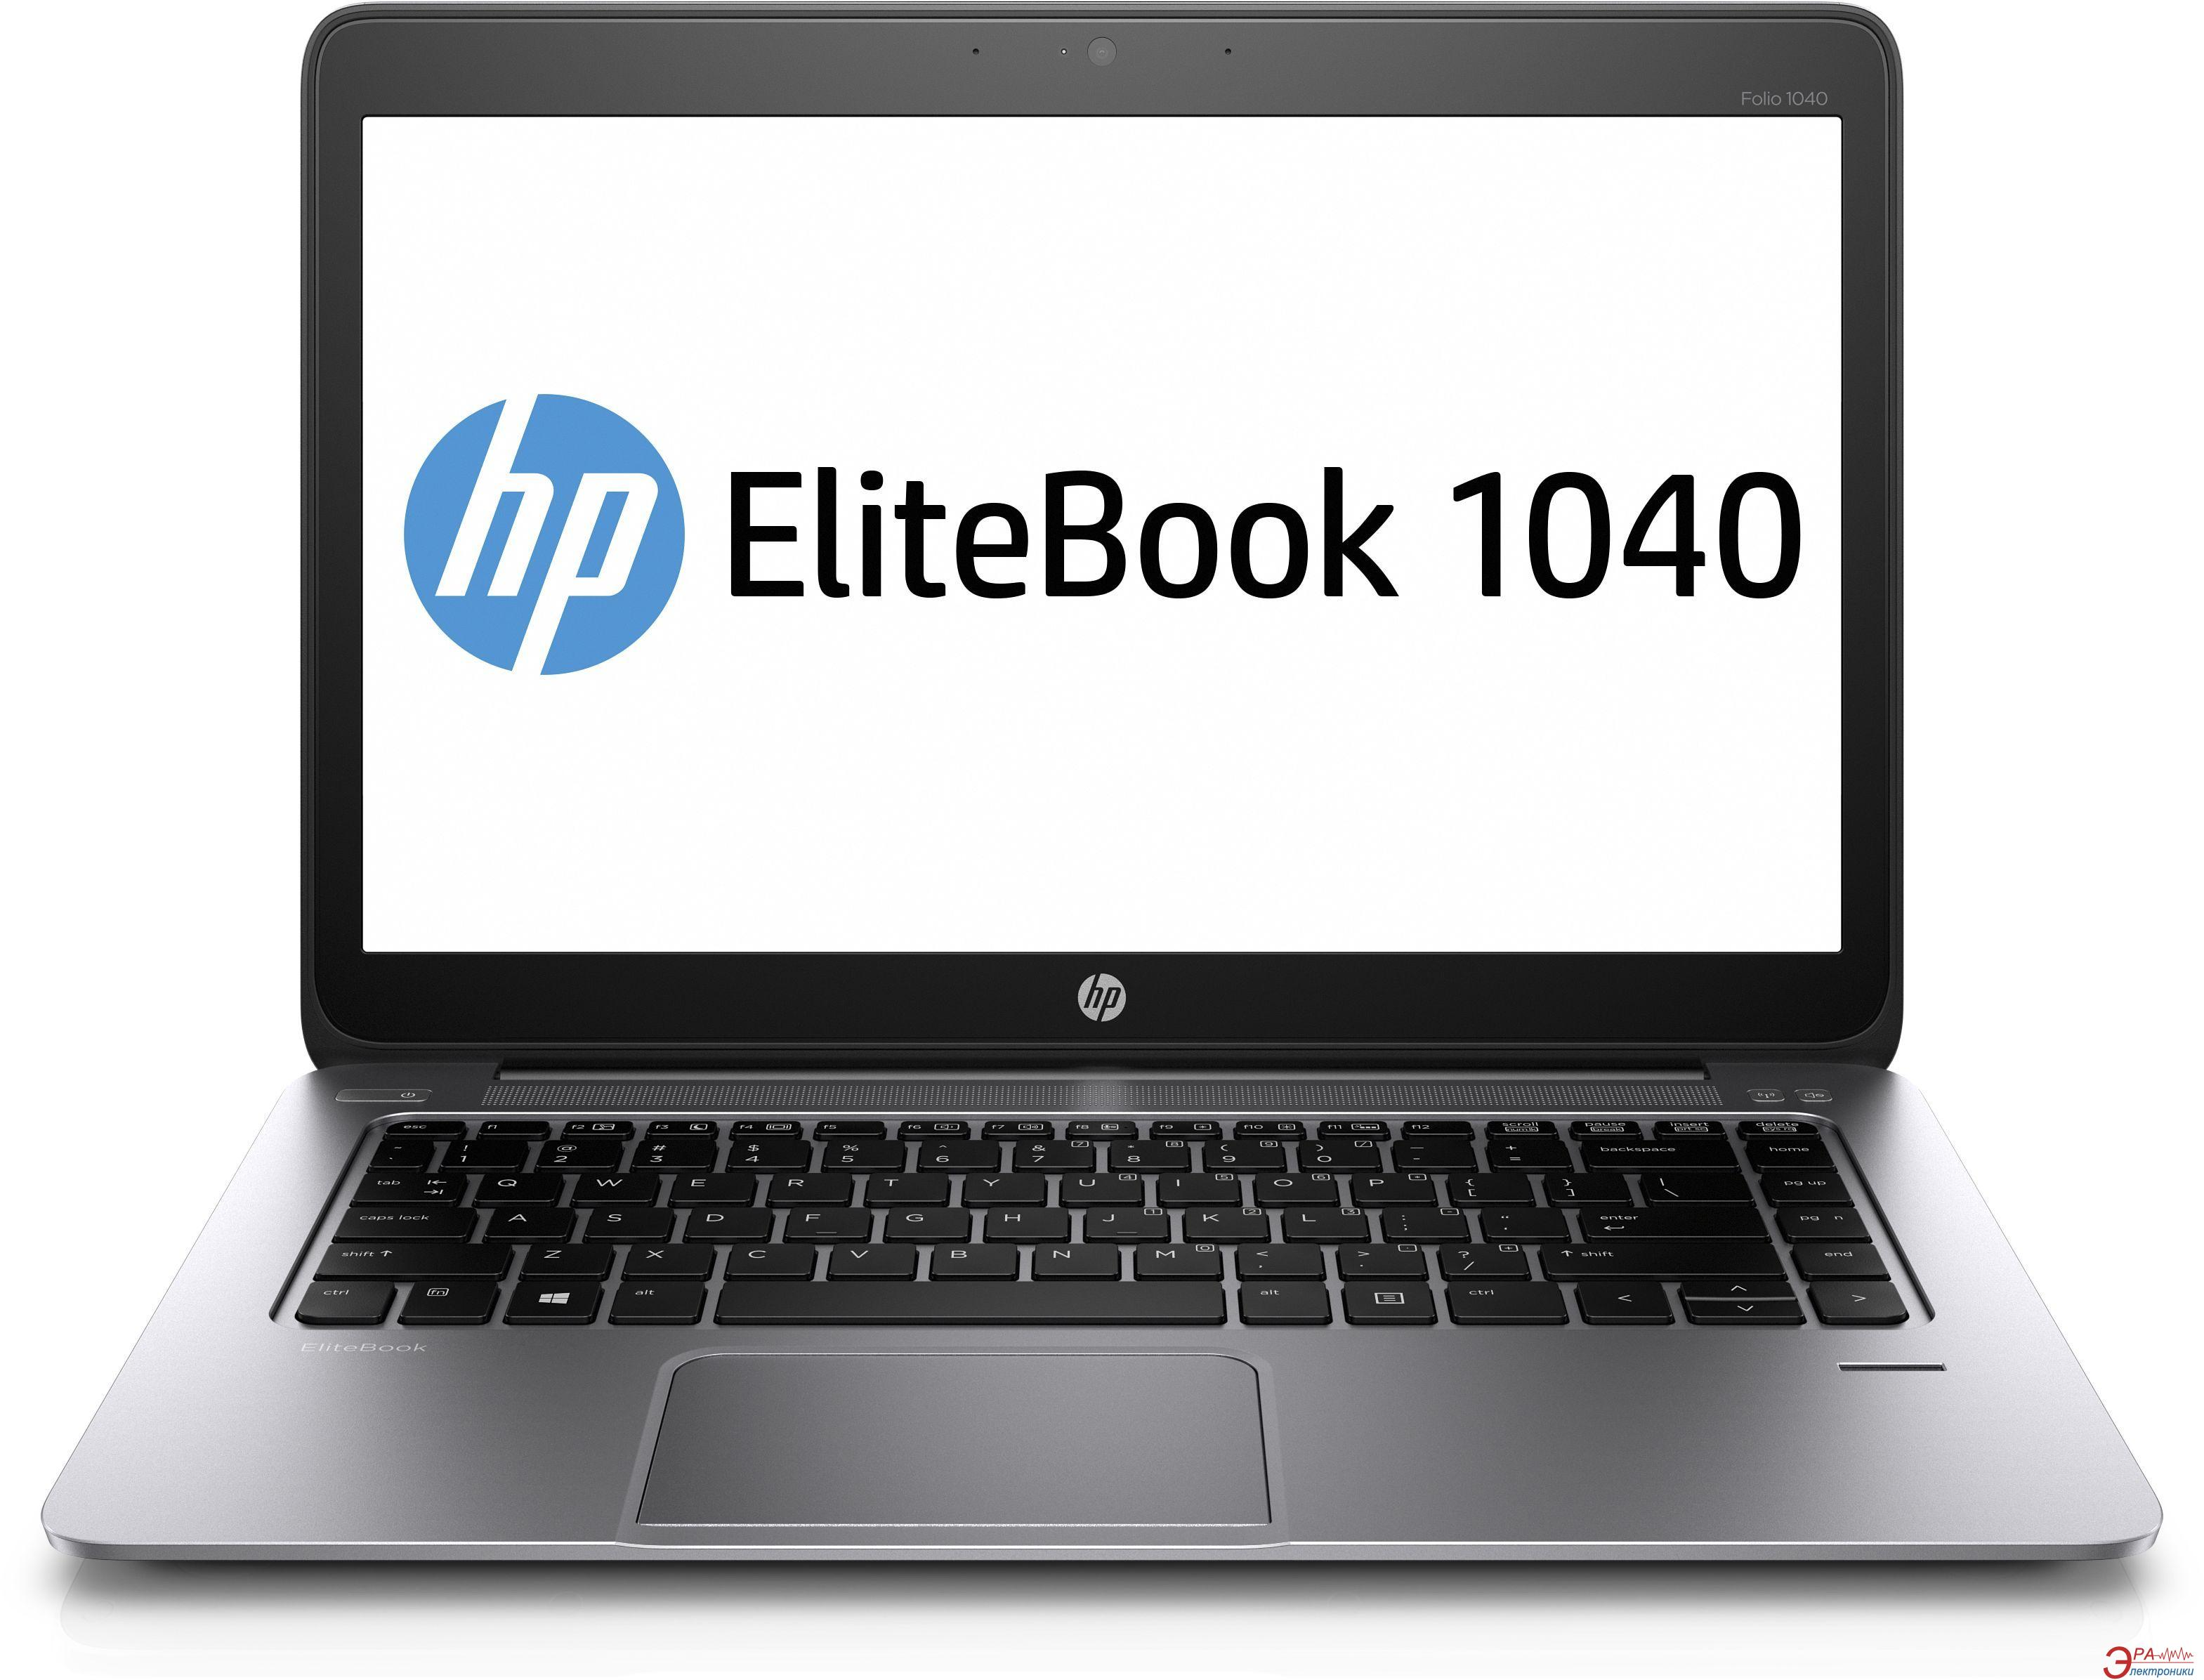 Ноутбук HP EliteBook 1040 (F6R38AV) Silver